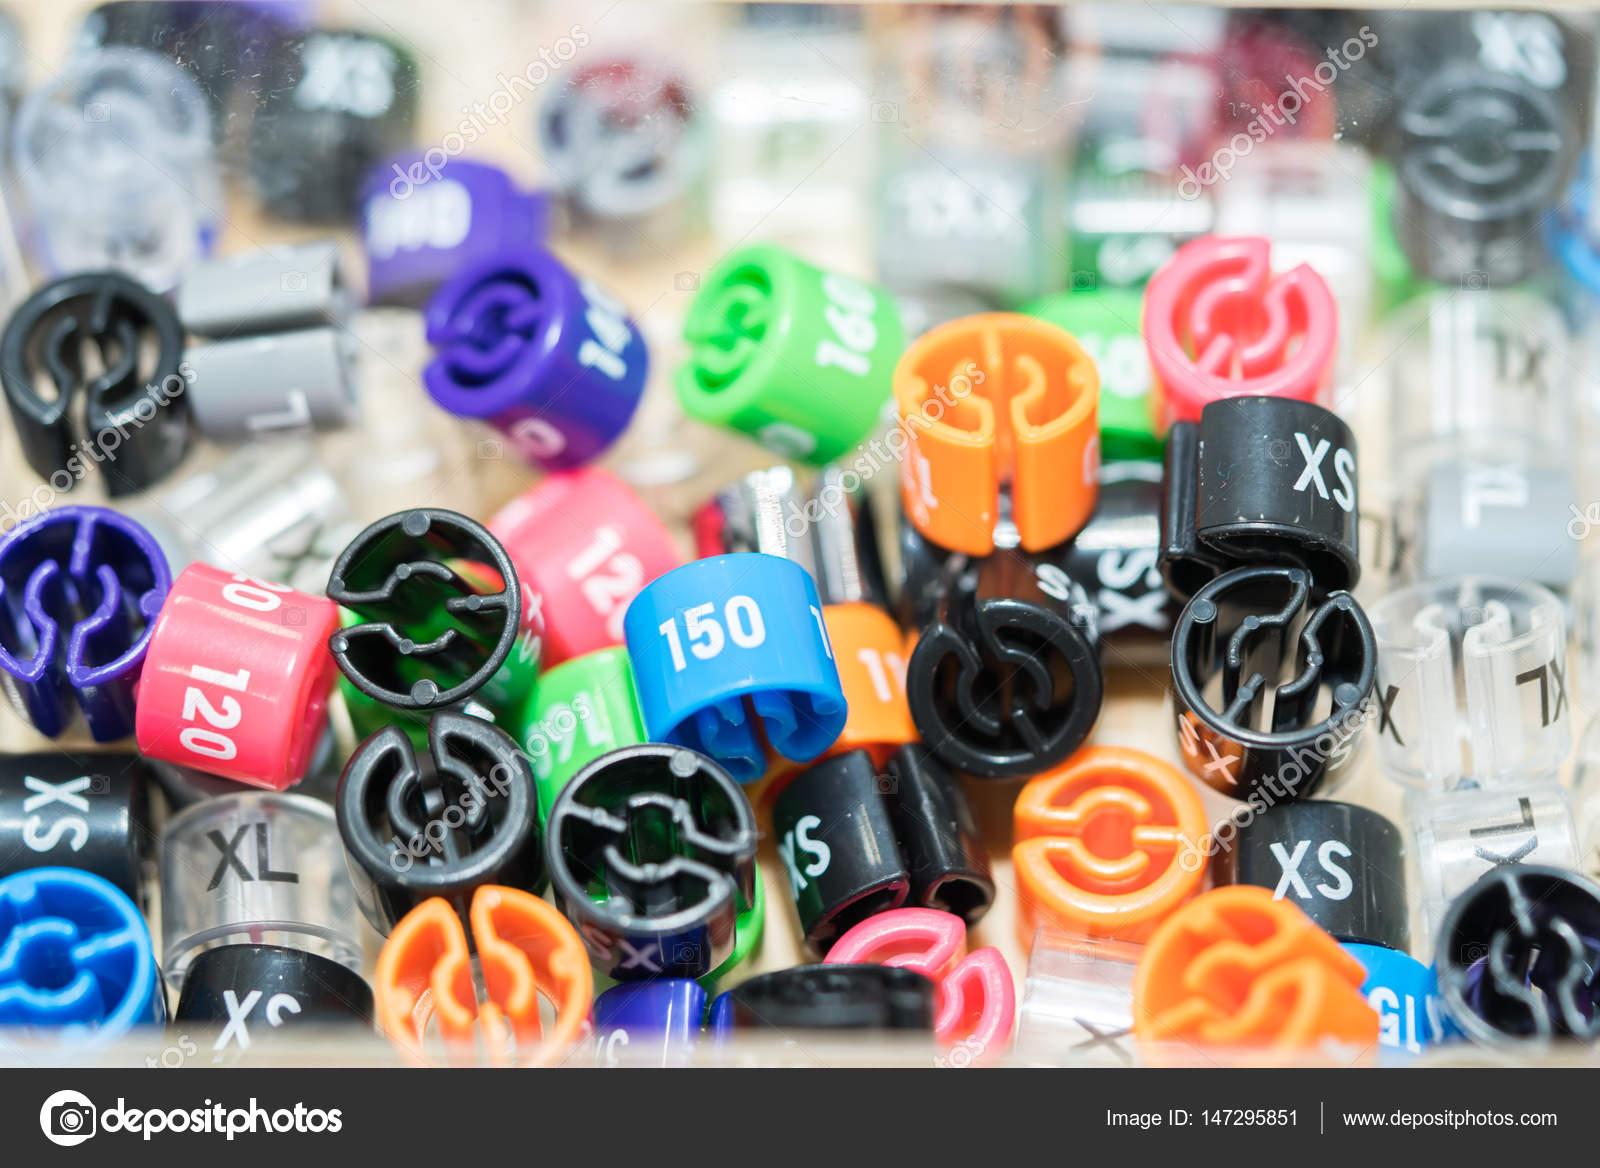 430ad1690aa2 Πλαστικές ετικέτες που υποδηλώνουν το μέγεθος των ρούχων για κρεμάστρες σε  ένα κουτί — Φωτογραφία Αρχείου